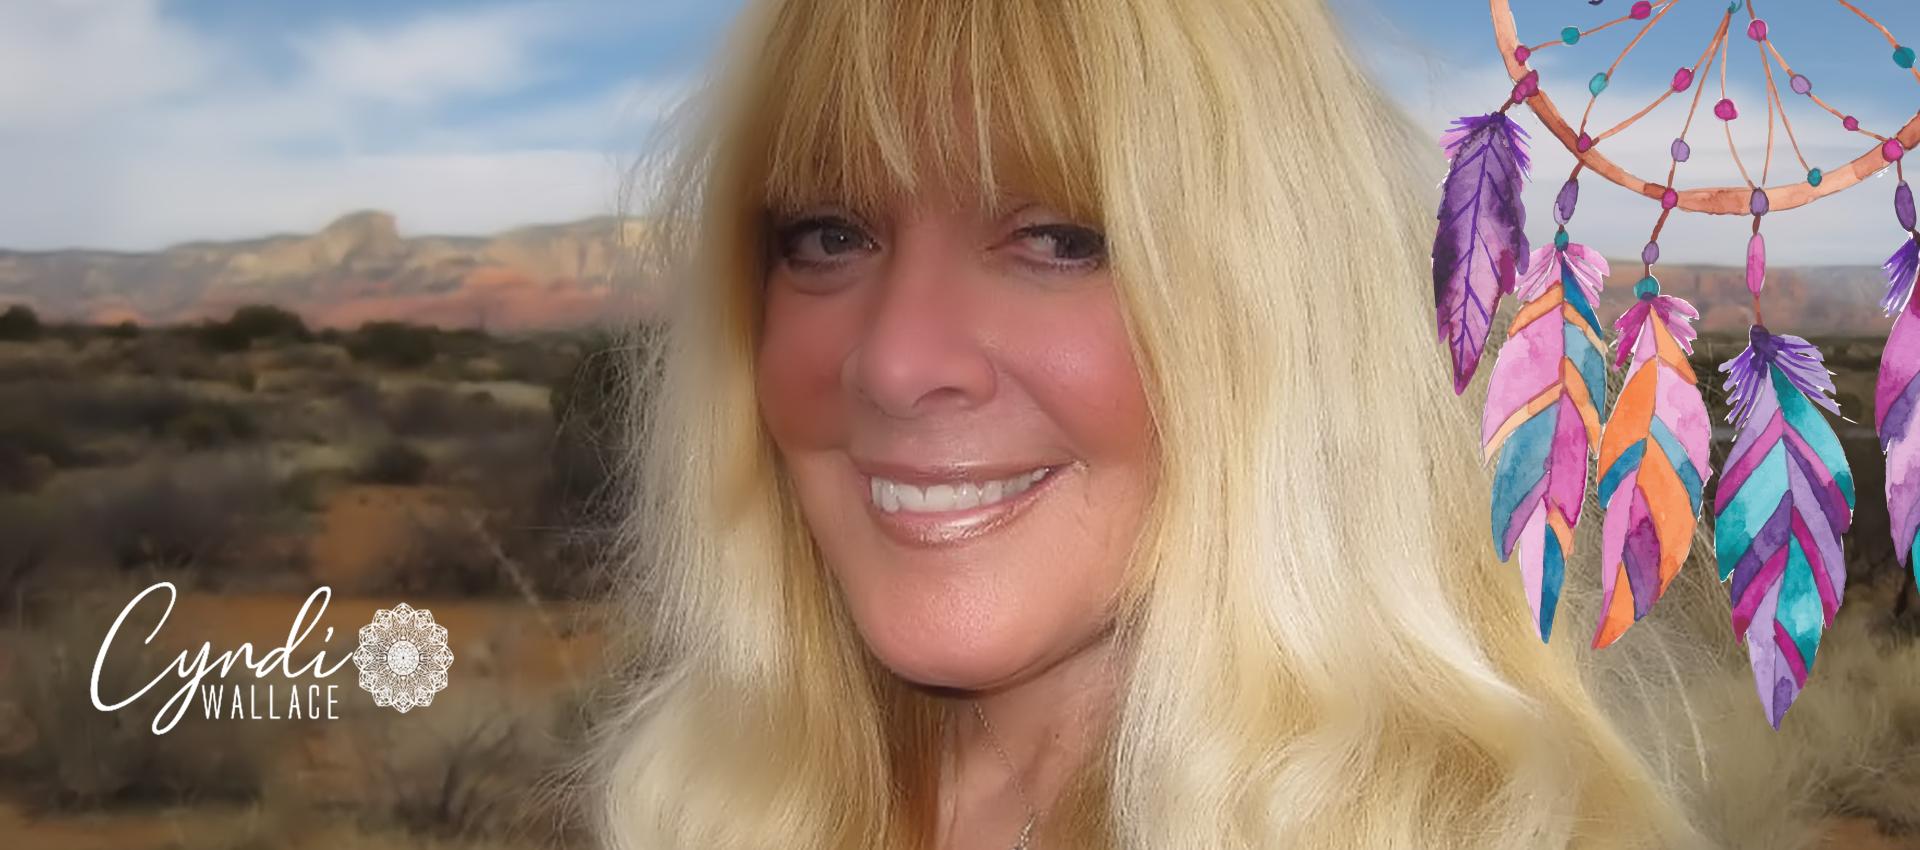 Cyndi Wallace - Psychic, Shaman, and Healer - VA Beach Psychic